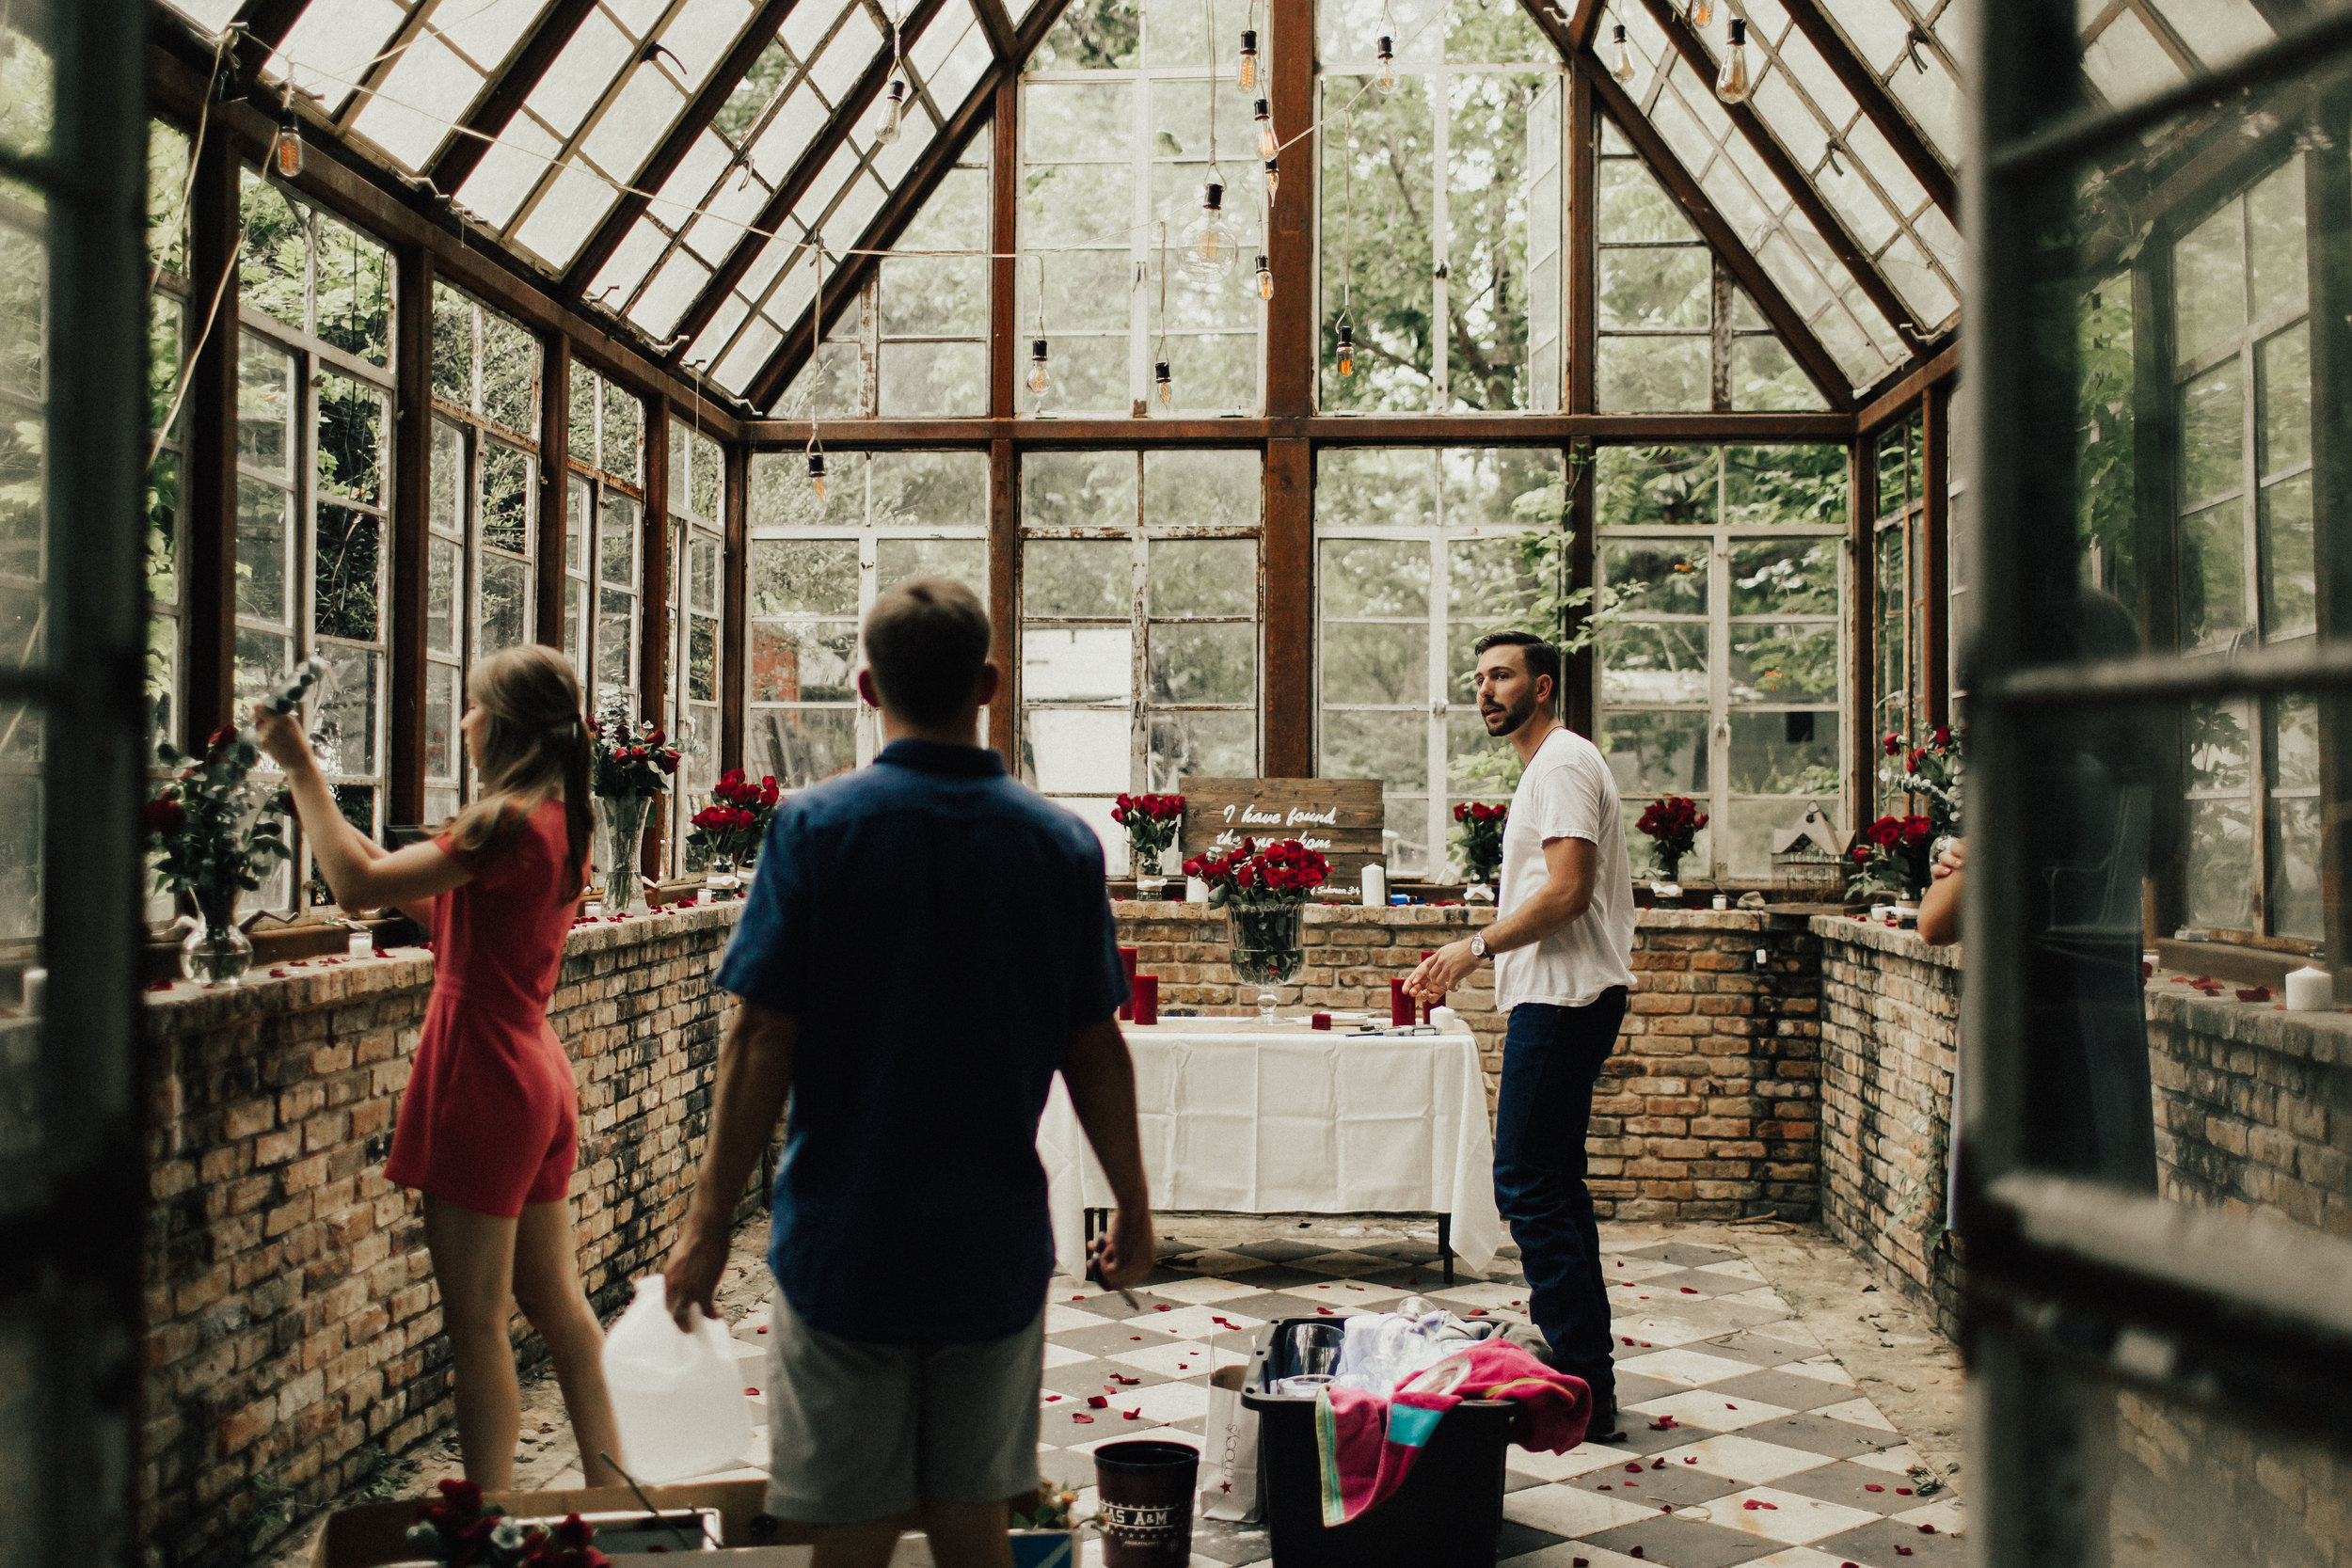 catie-michael-sekrit-theatre-austin-texas-wedding-photography-bride-groom2.jpg